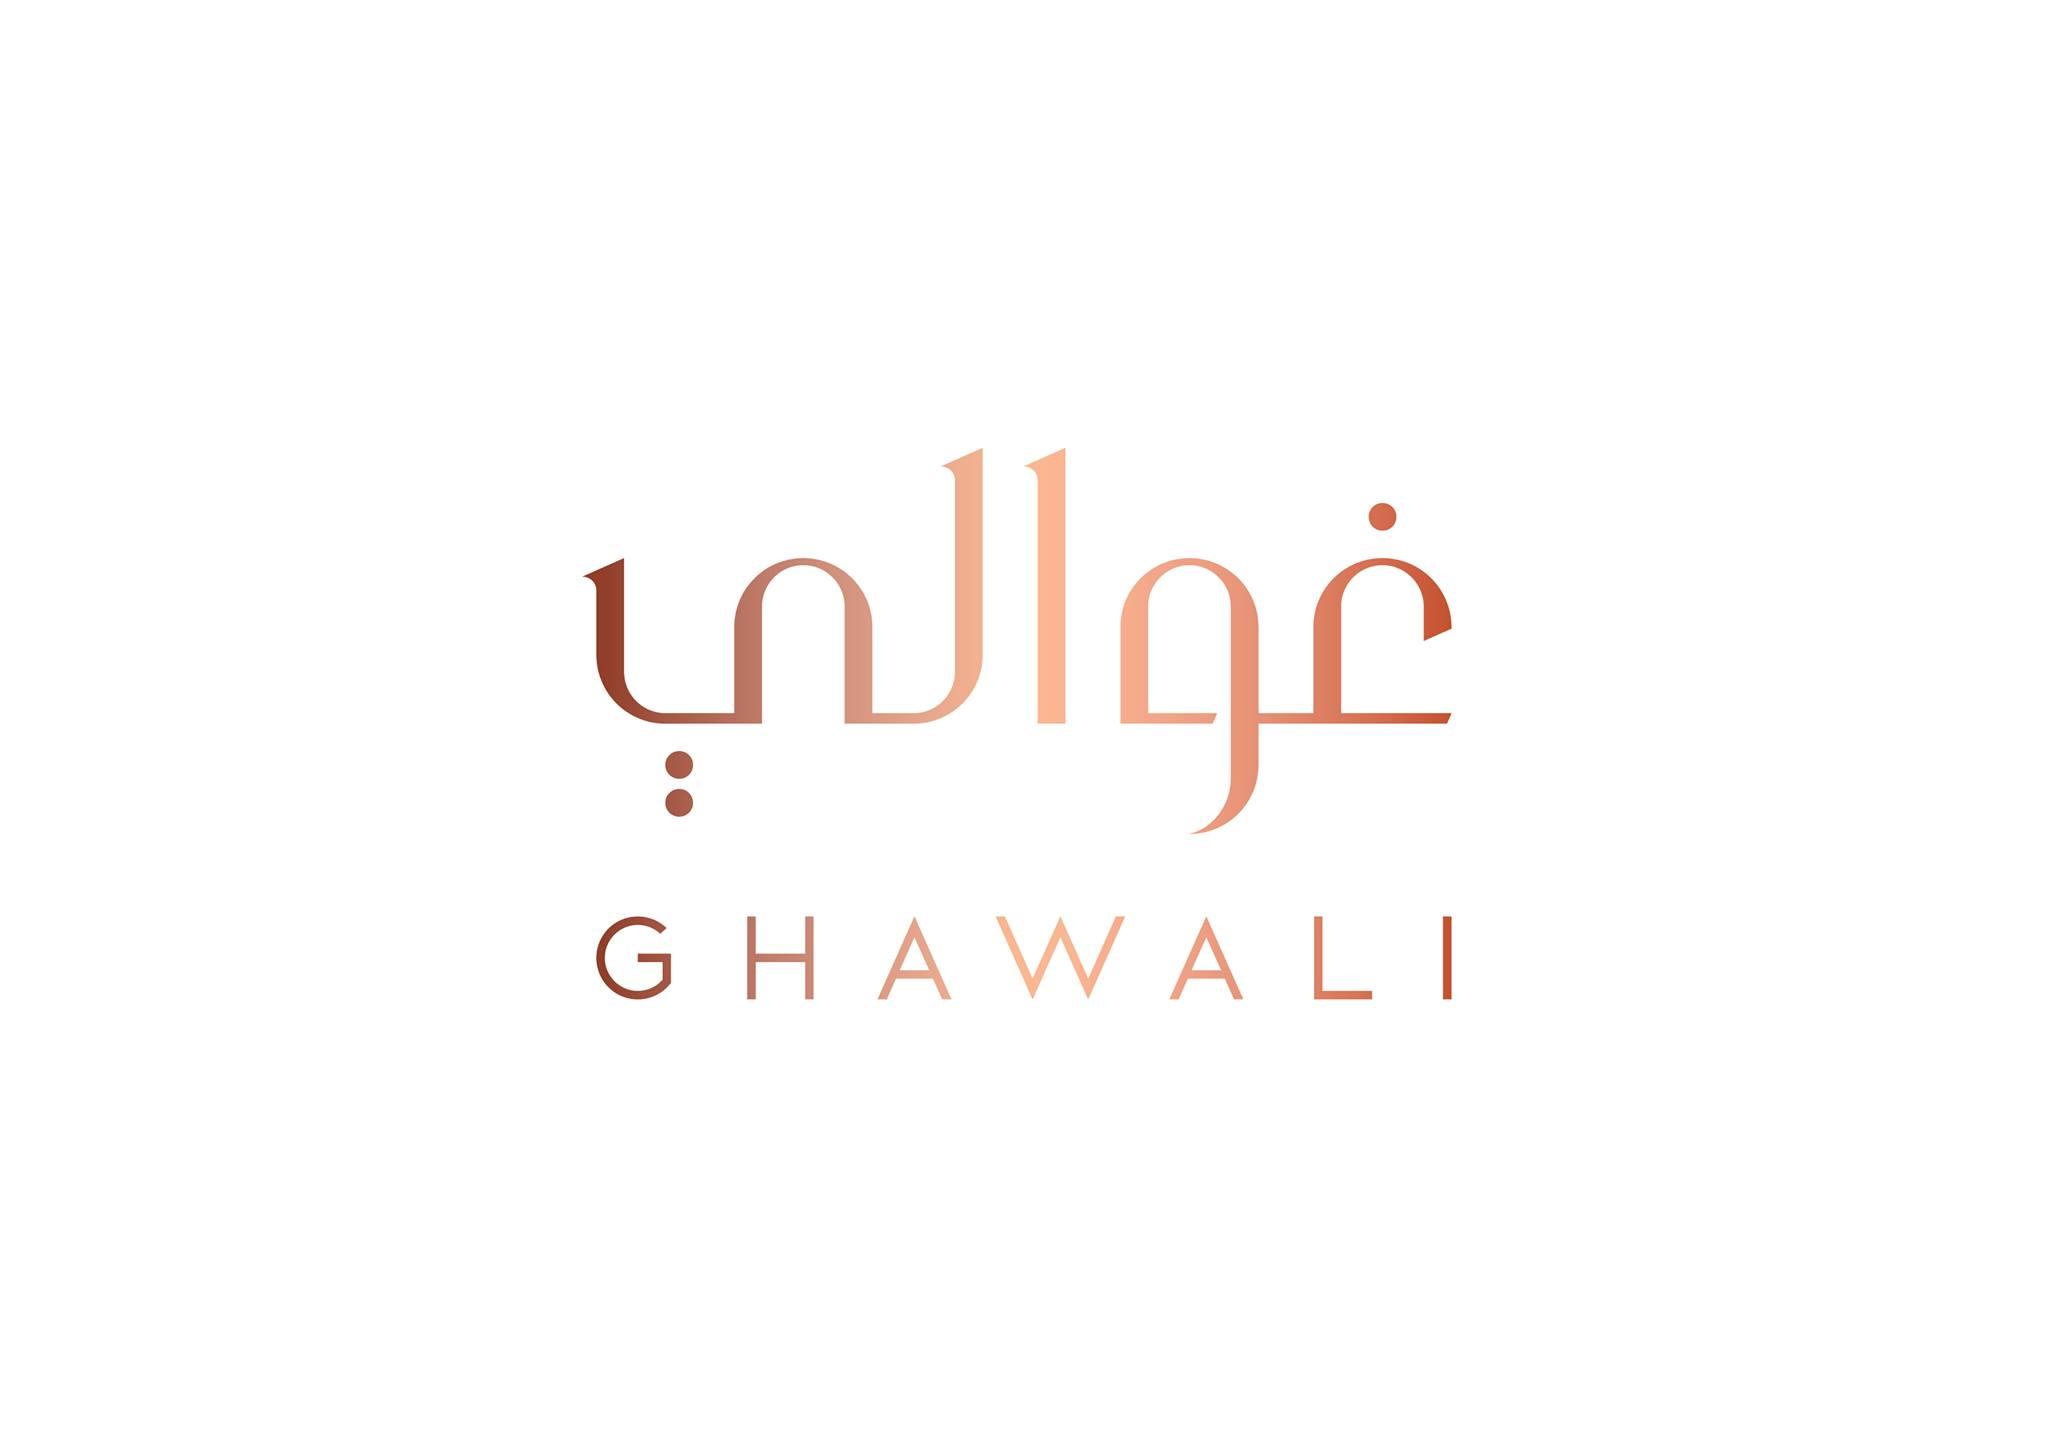 Ghawali - Luxury Perfume Online